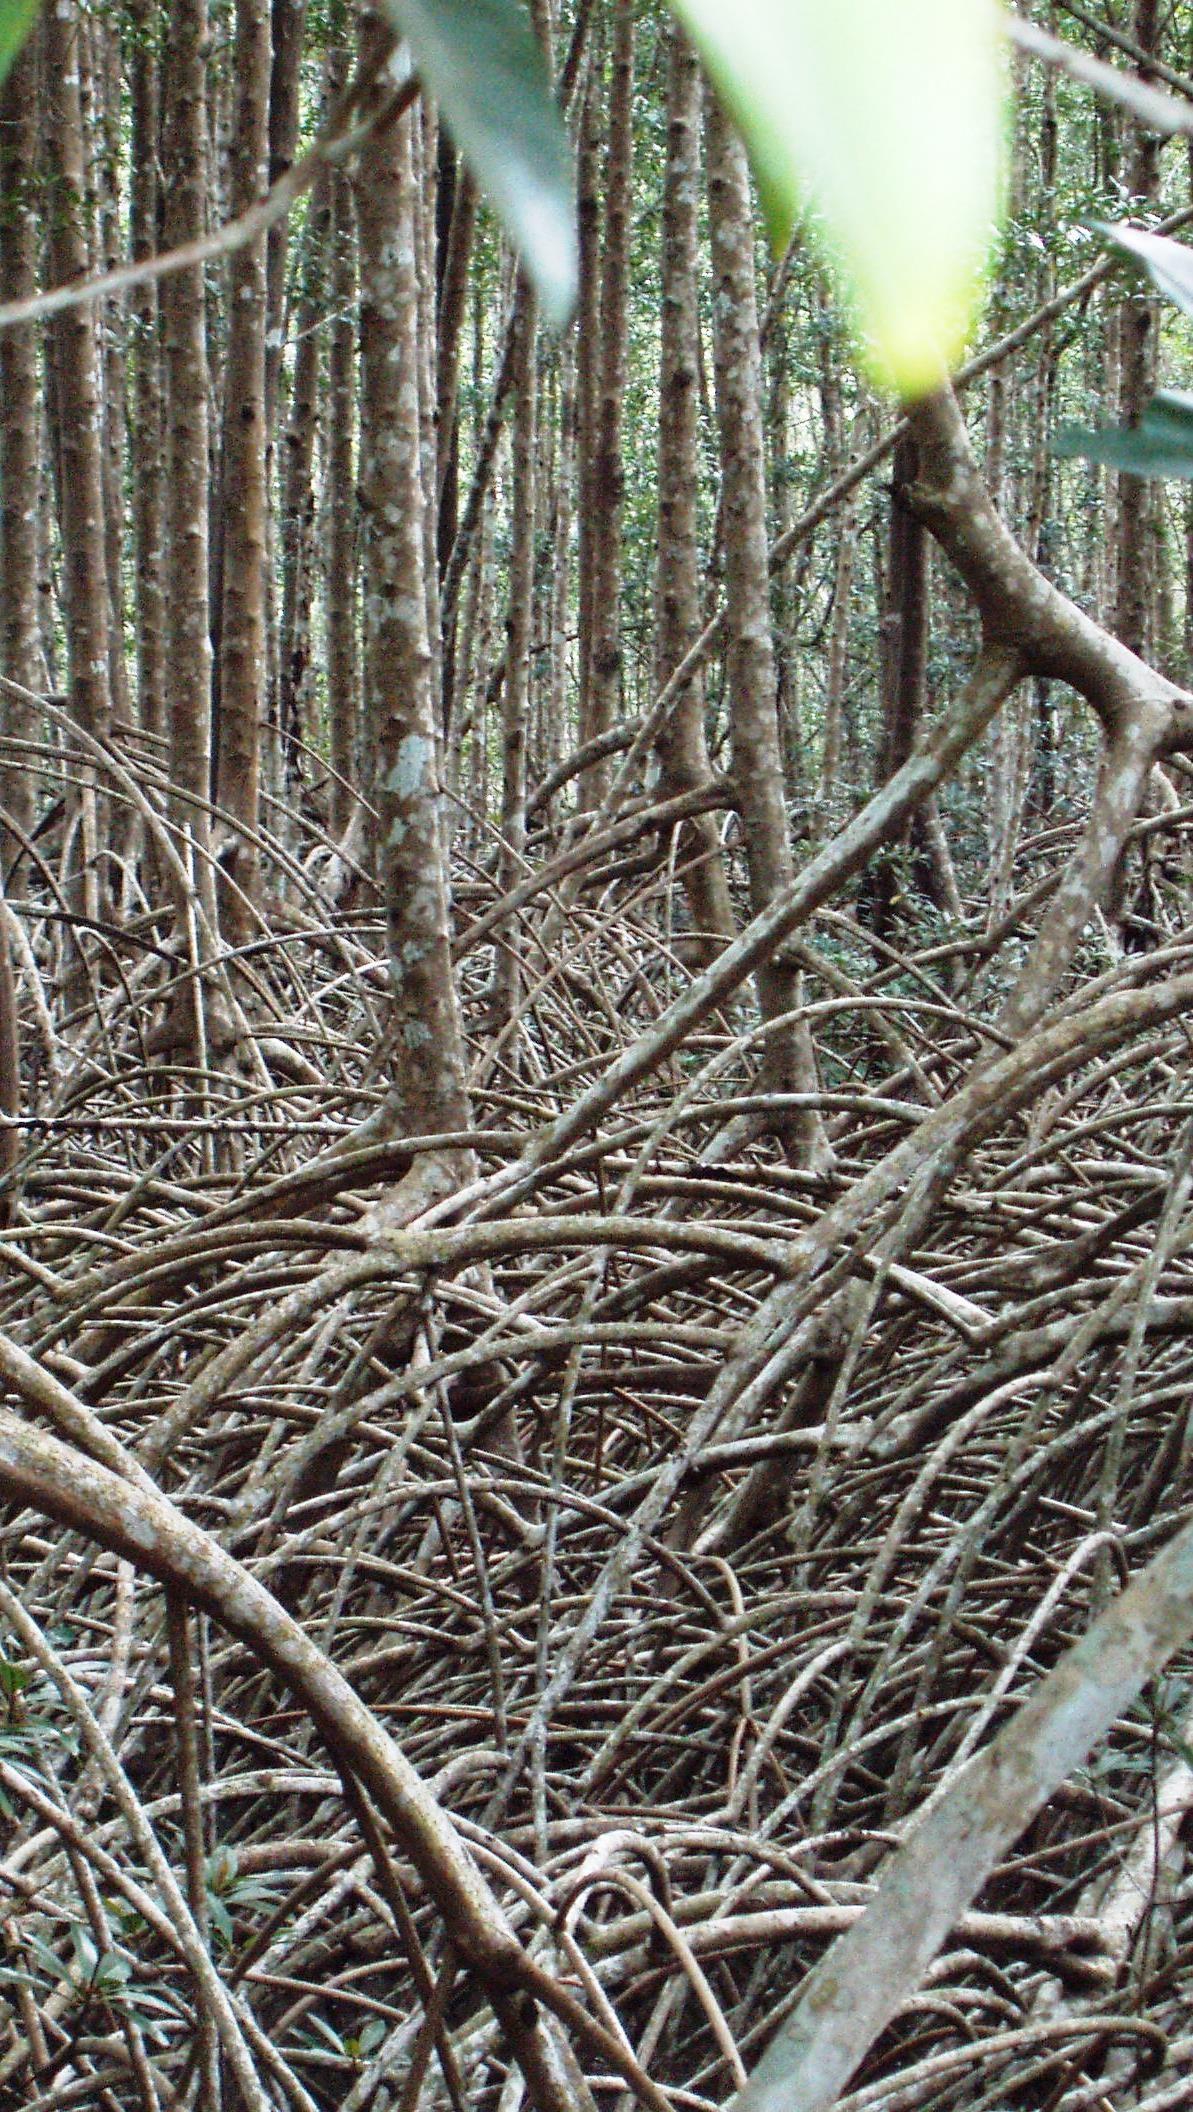 Mangroves in Bonthe District, Sierra Leone